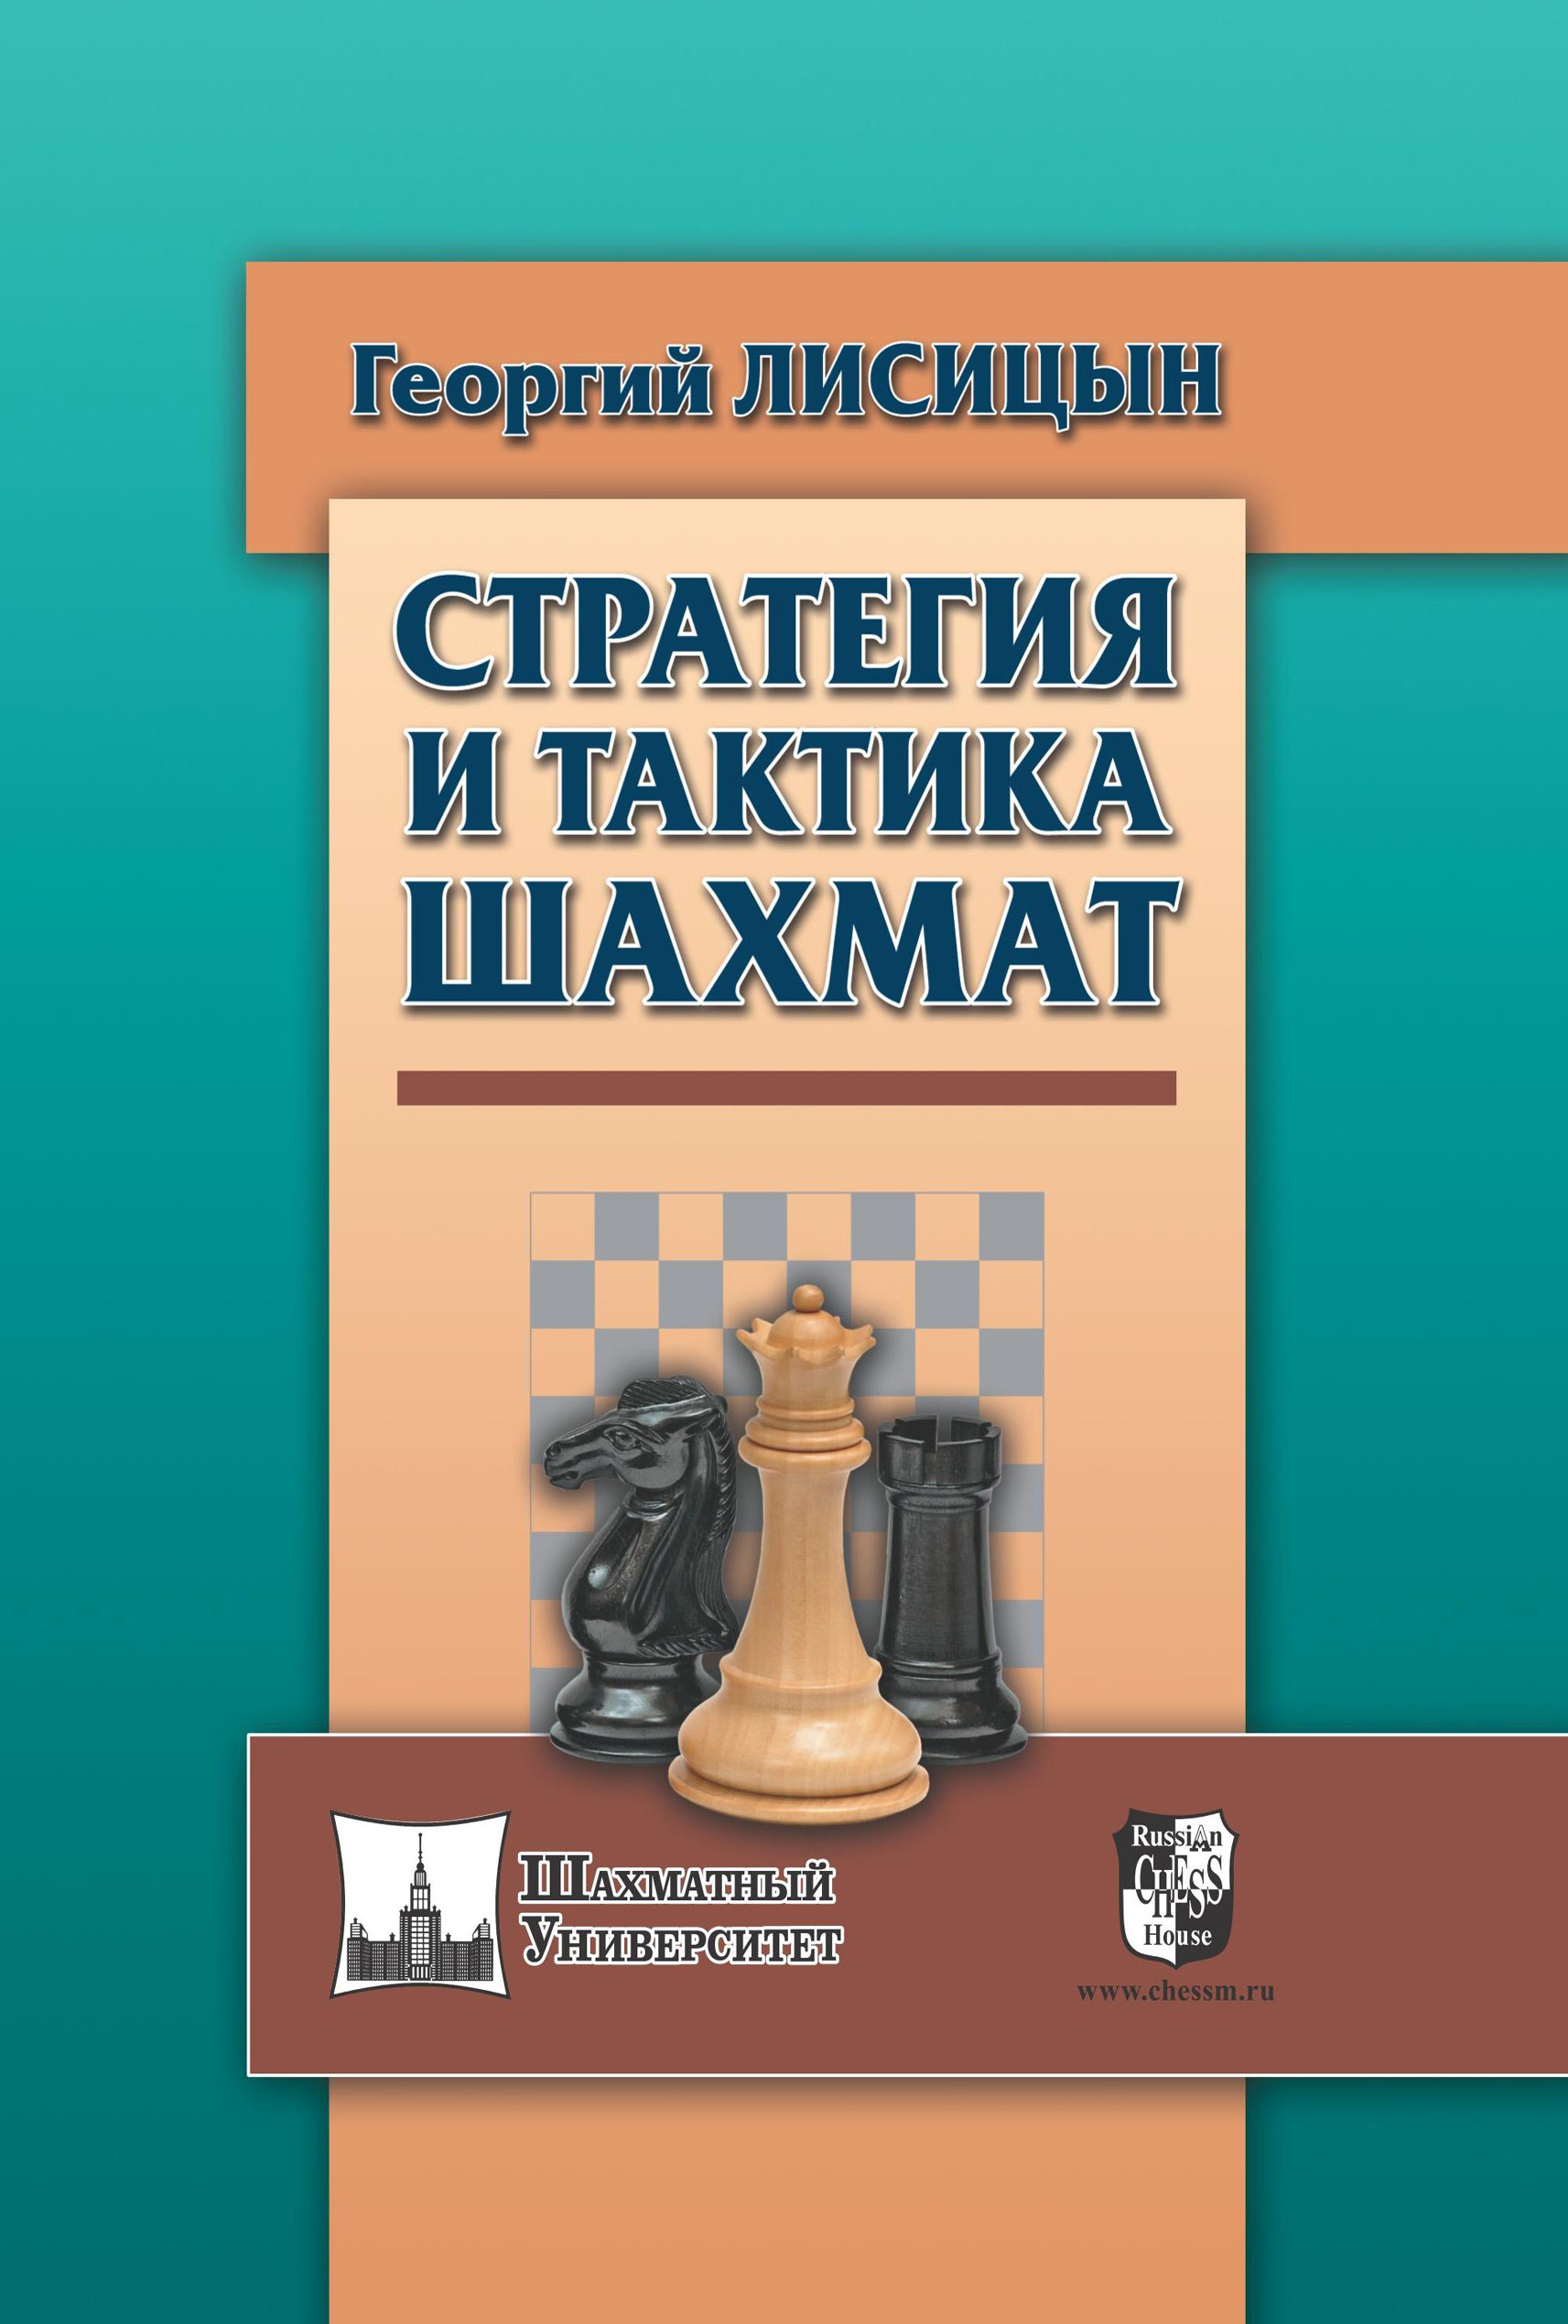 Георгий Лисицын Стратегия и тактика шахмат